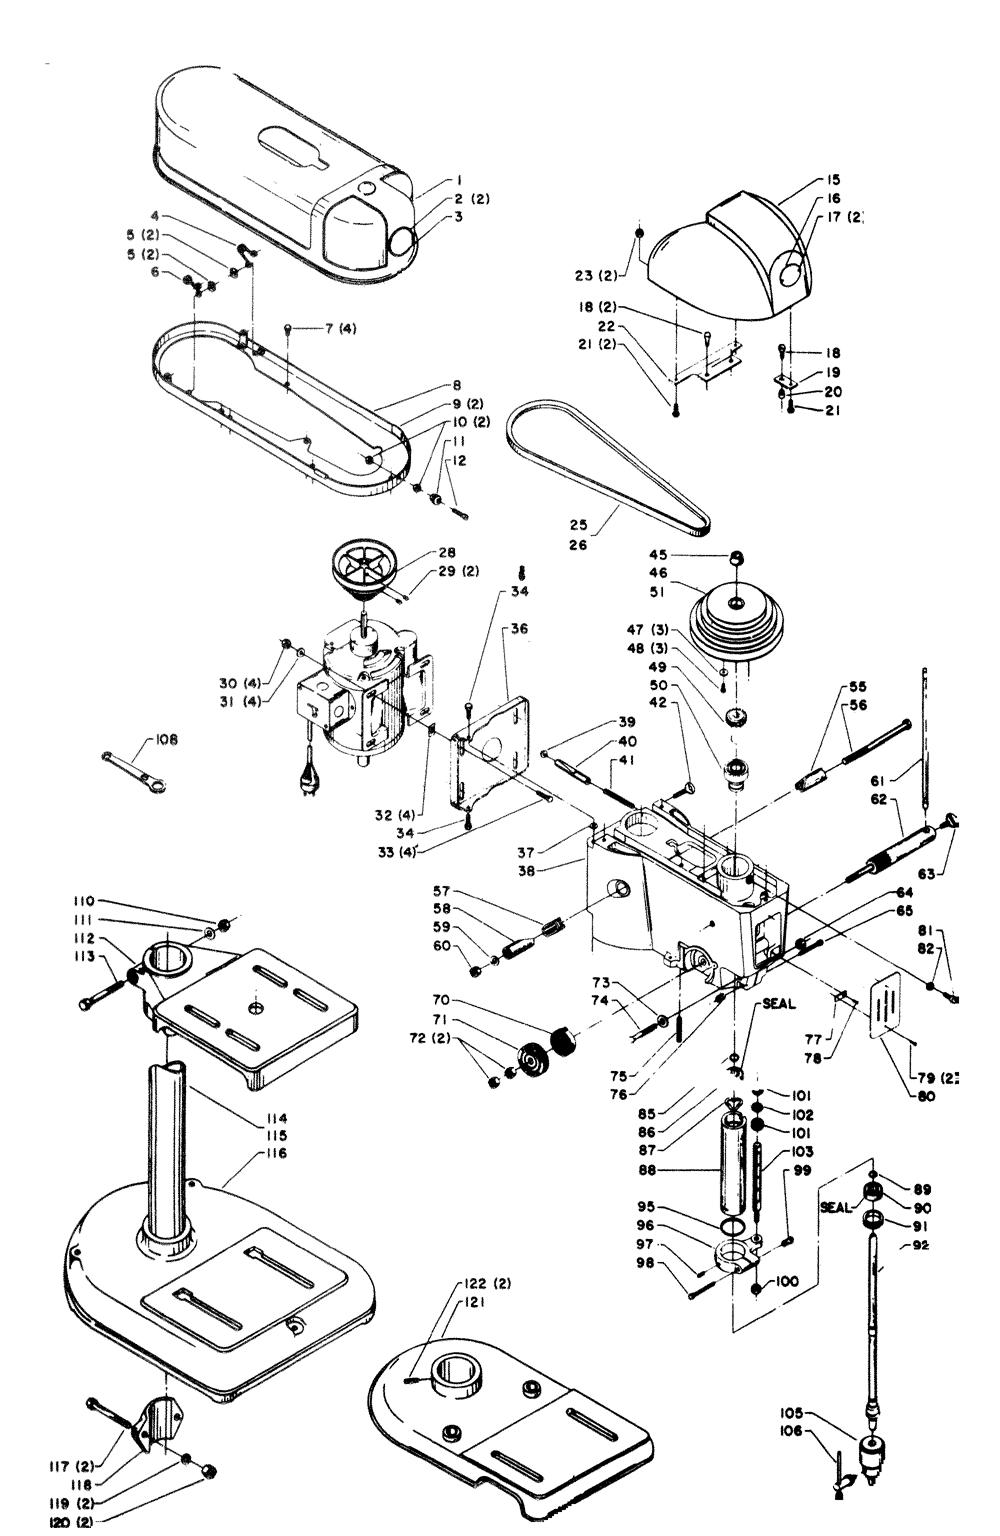 Ice O Matic Model Cf800a38p Wiring Diagram Ice Machine